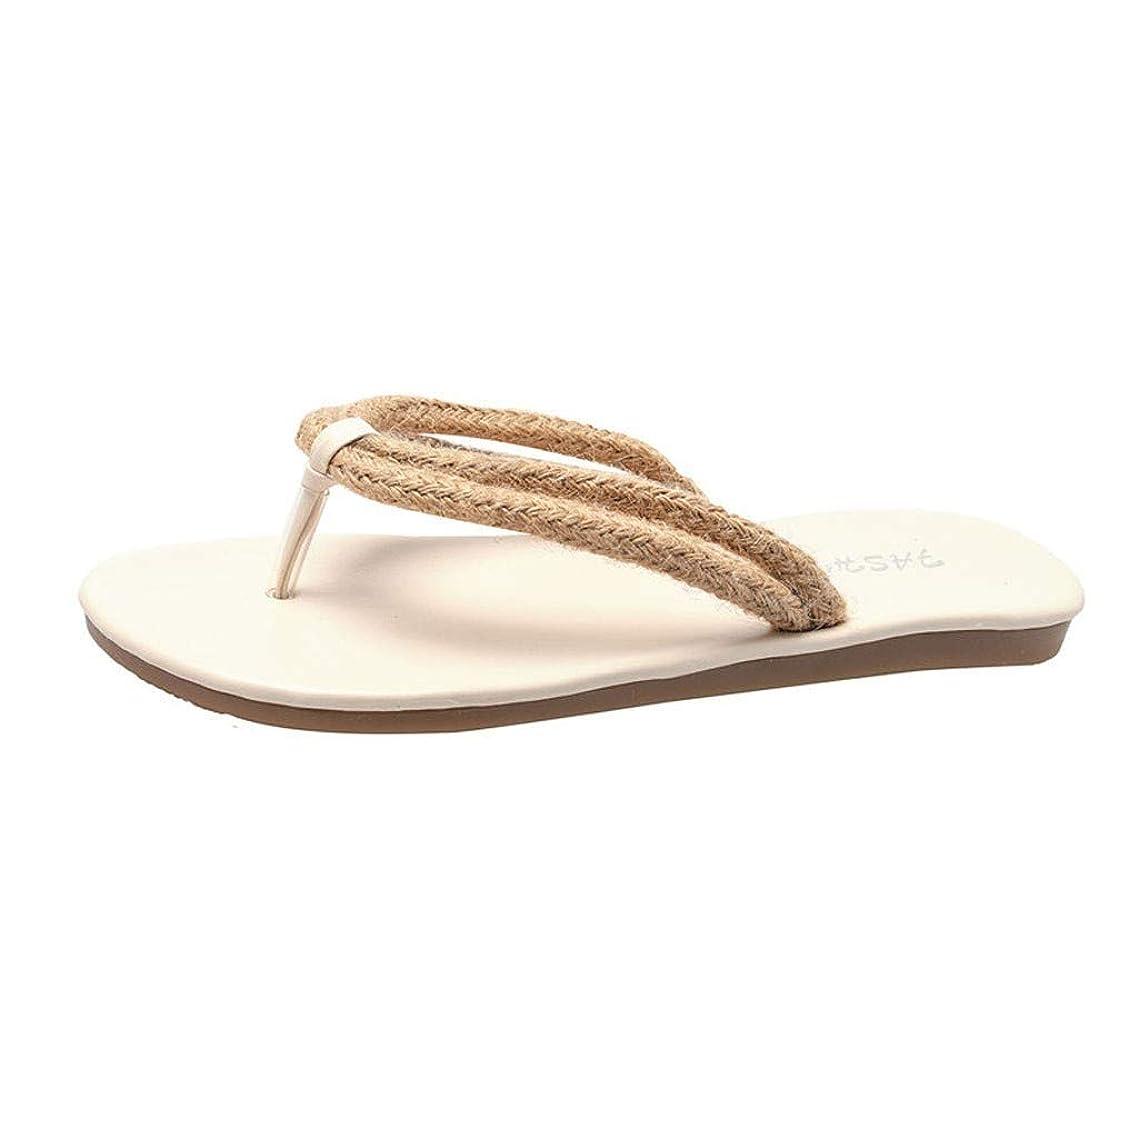 Aunimeifly Women Woven Rope Band Flip Flops Summer Beach Sandals Solid Color Flat Ladies Flatform Slides